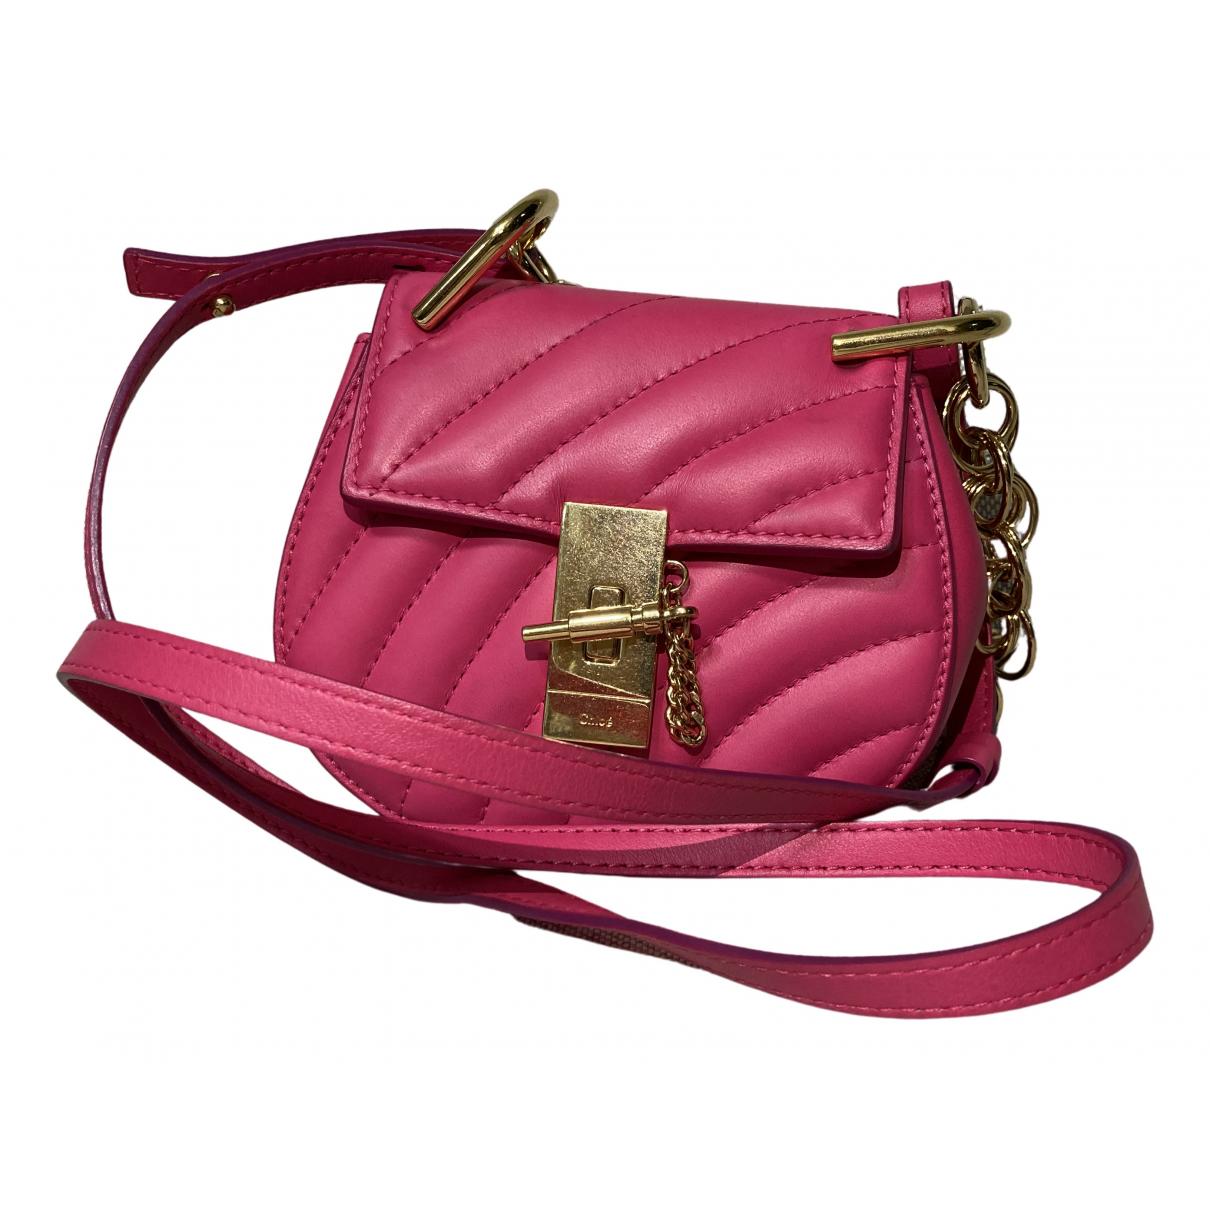 Chloé Drew Pink Leather handbag for Women N